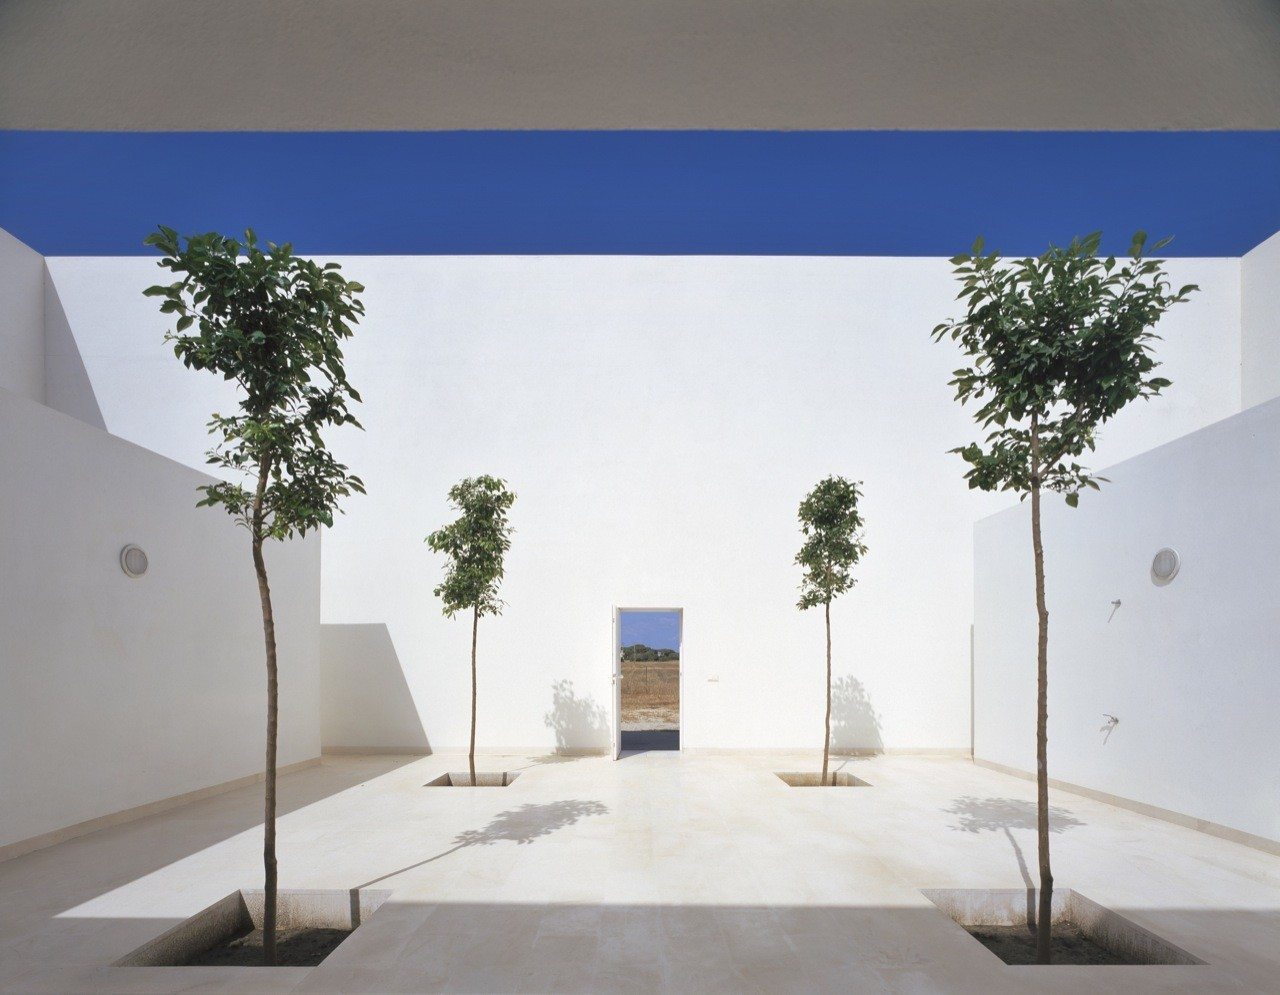 Architekt: Alberto Campo, Baeza Projekt: Casa Guerrero Ort: Zahora